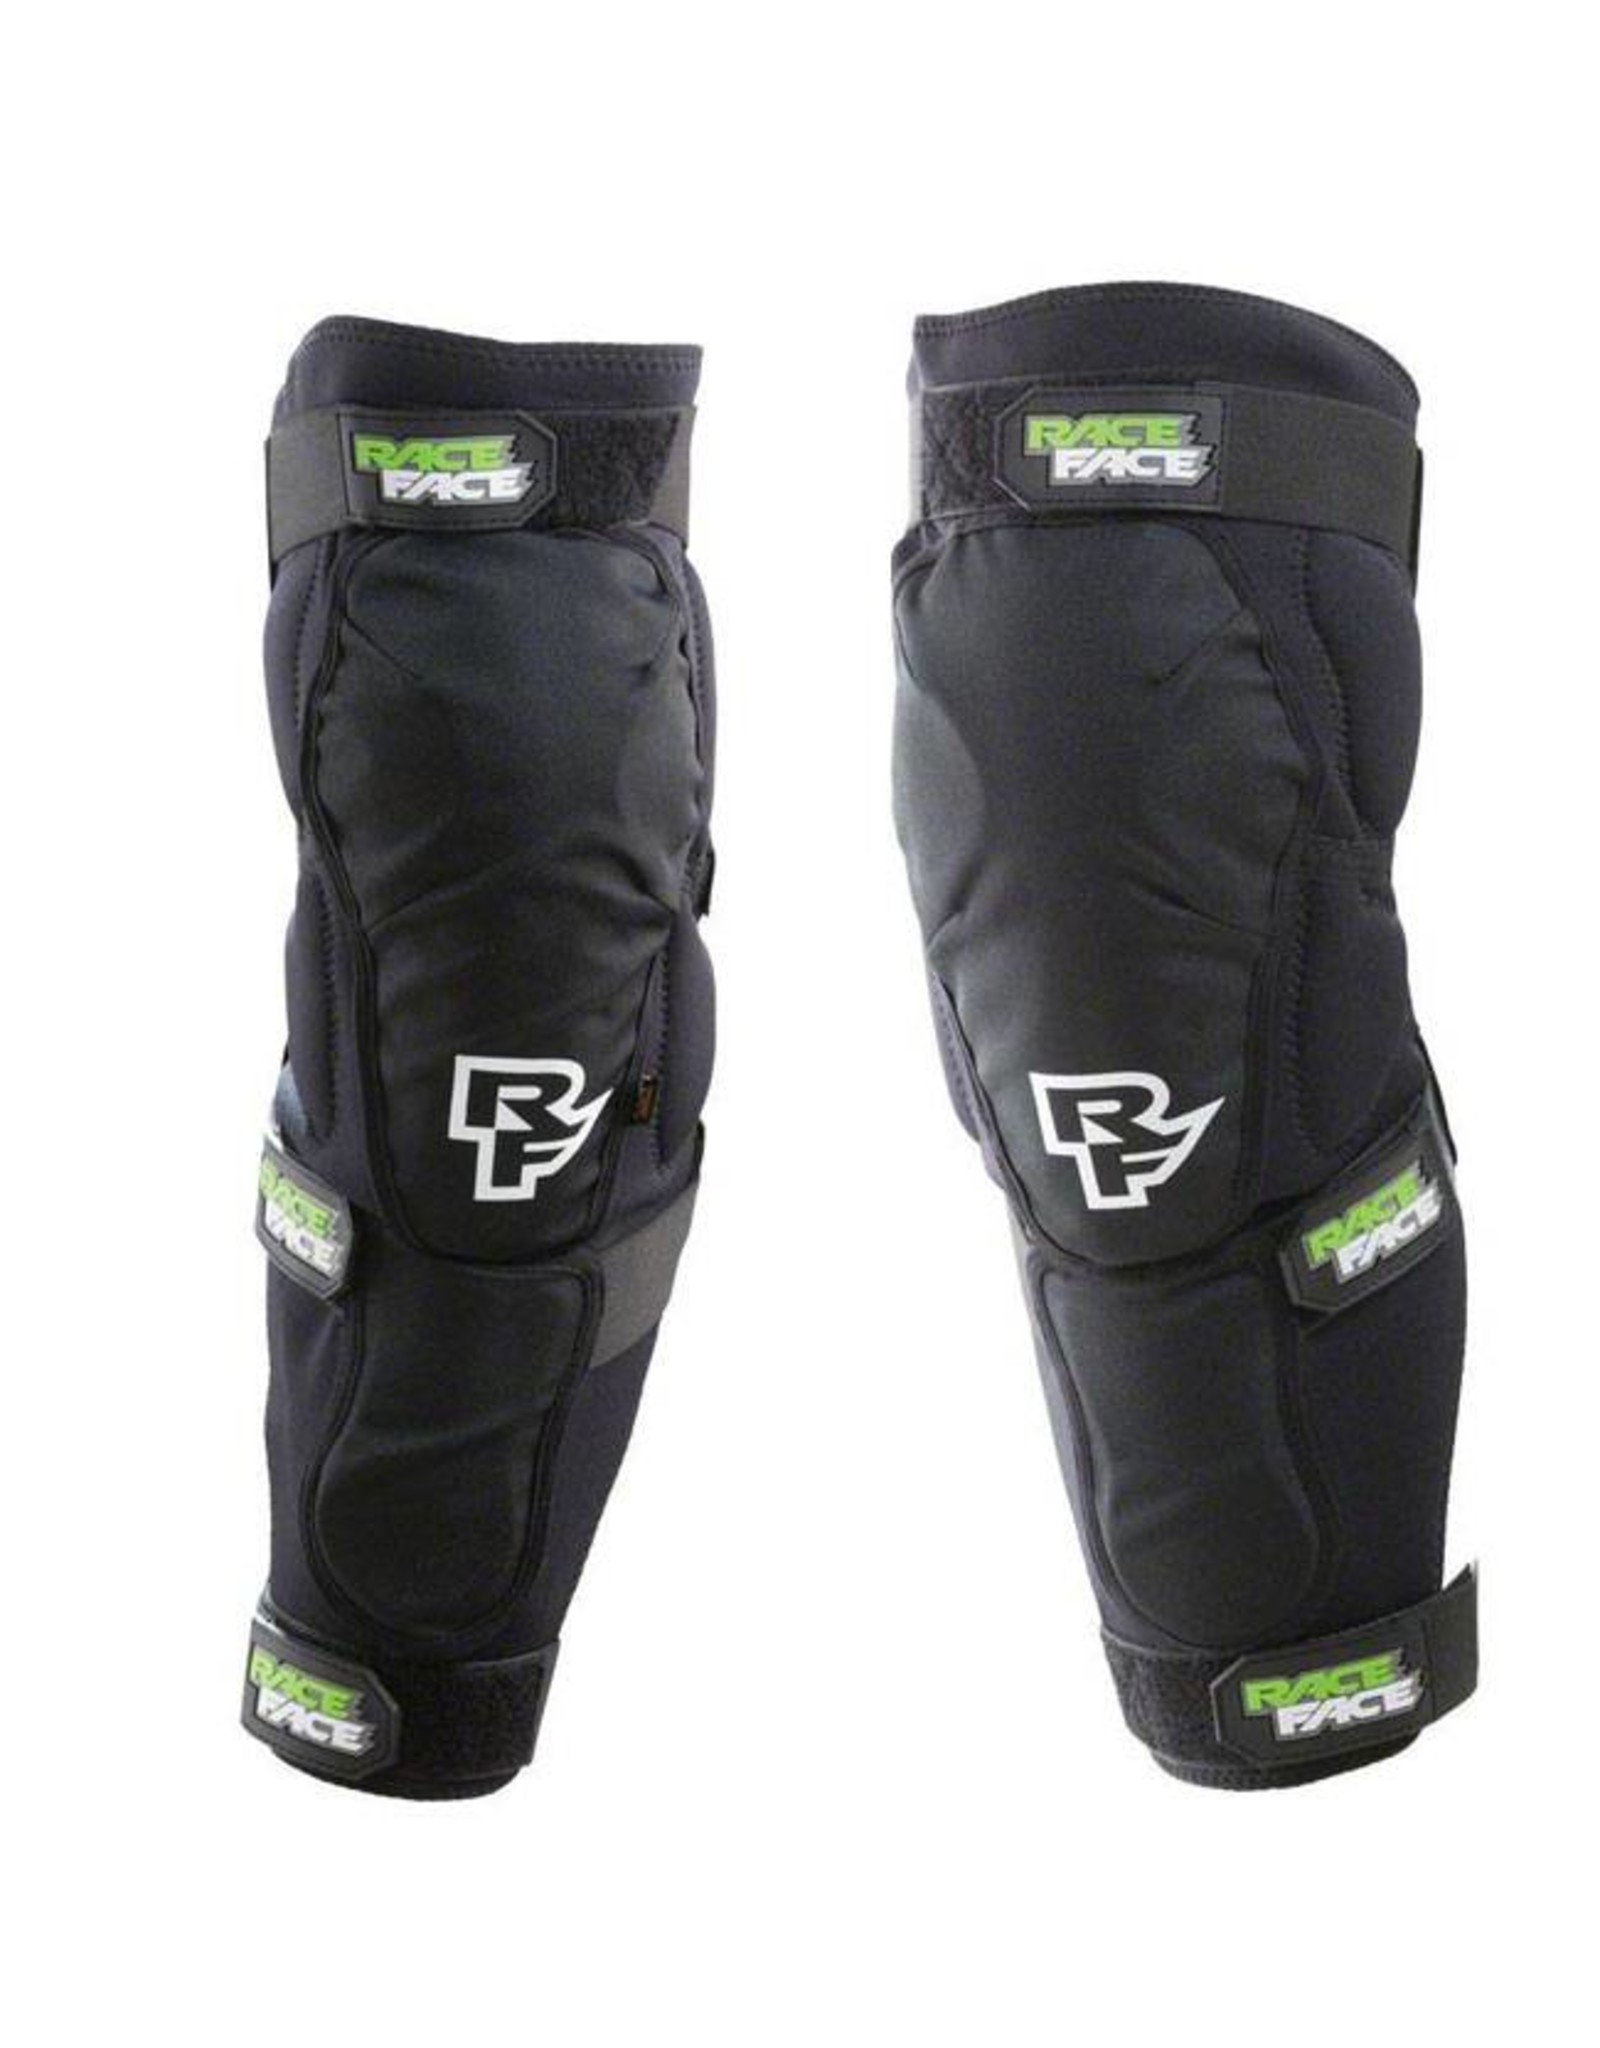 RaceFace RaceFace Flank Leg Guard: Black LG